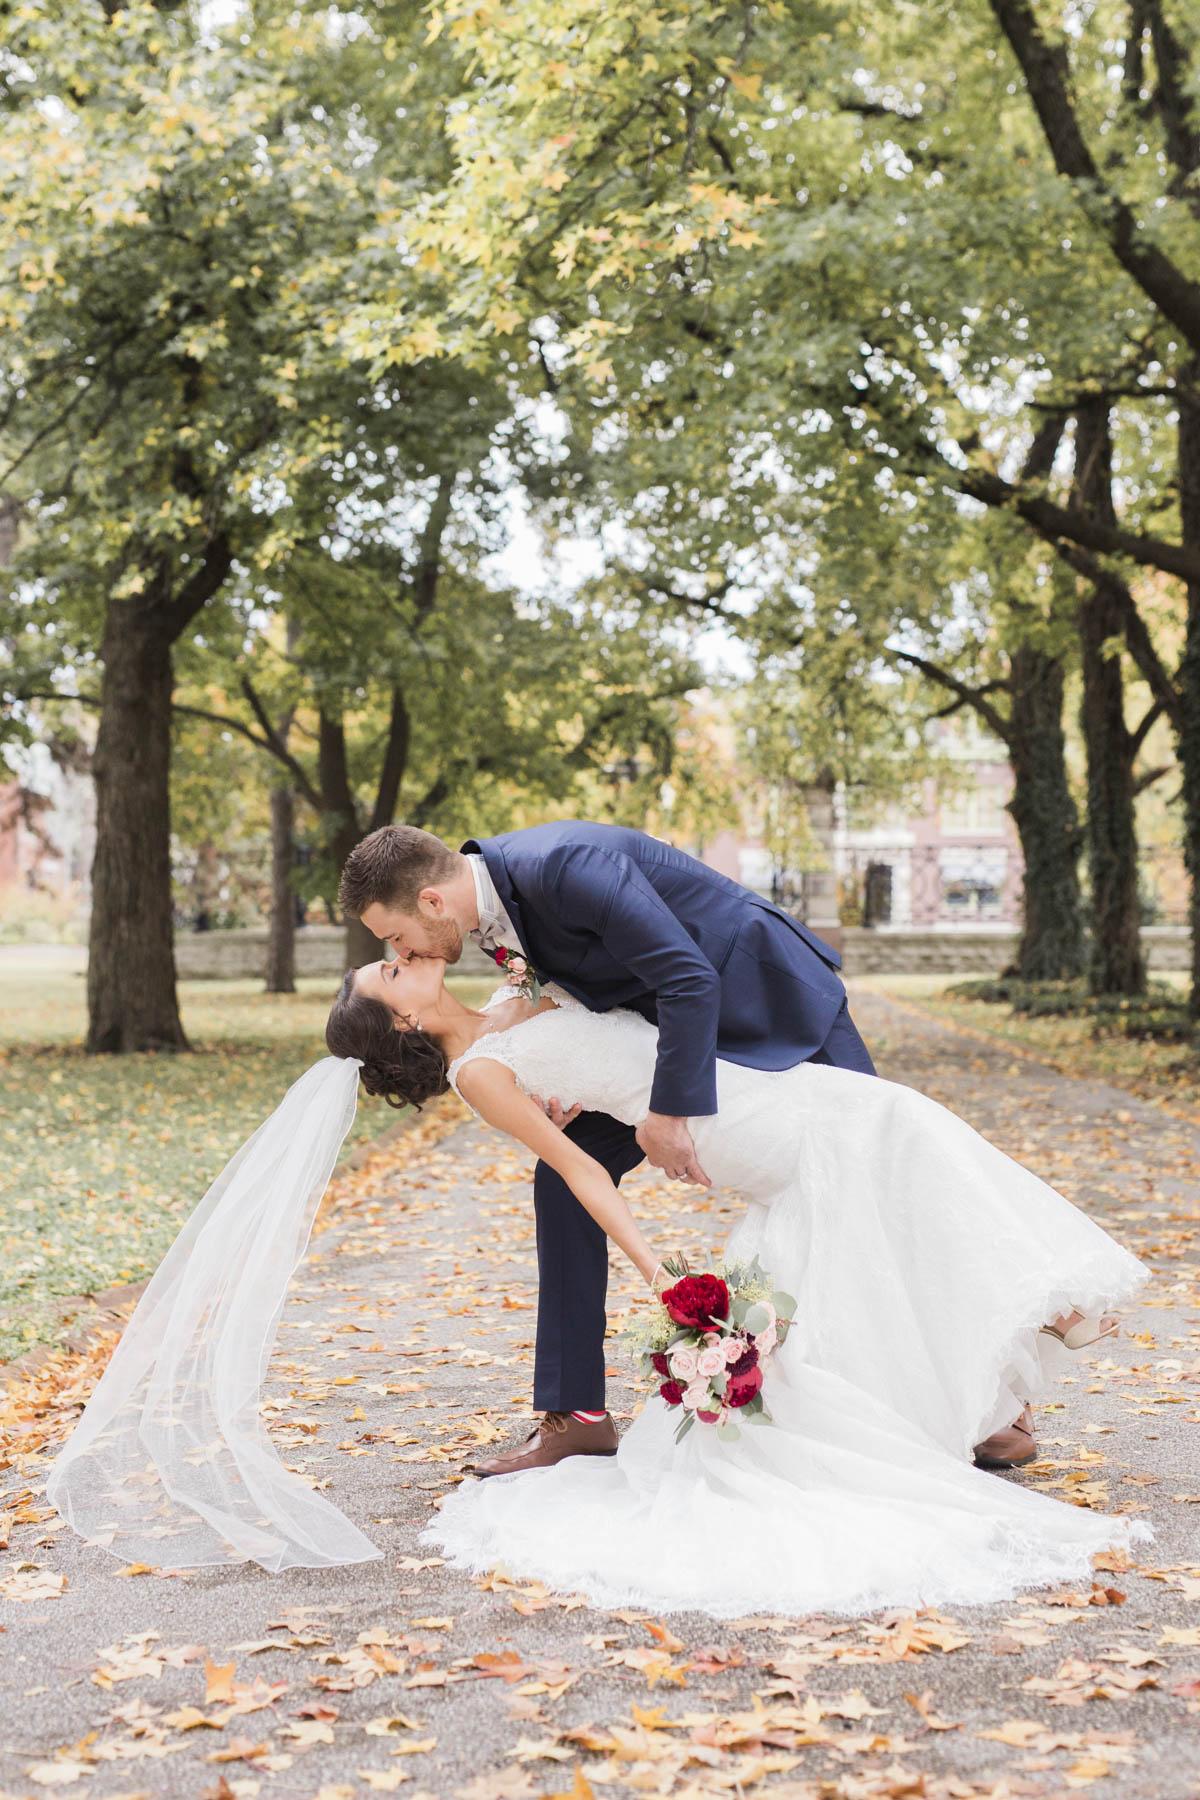 shotbychelsea_wedding_photography_blog-15.jpg